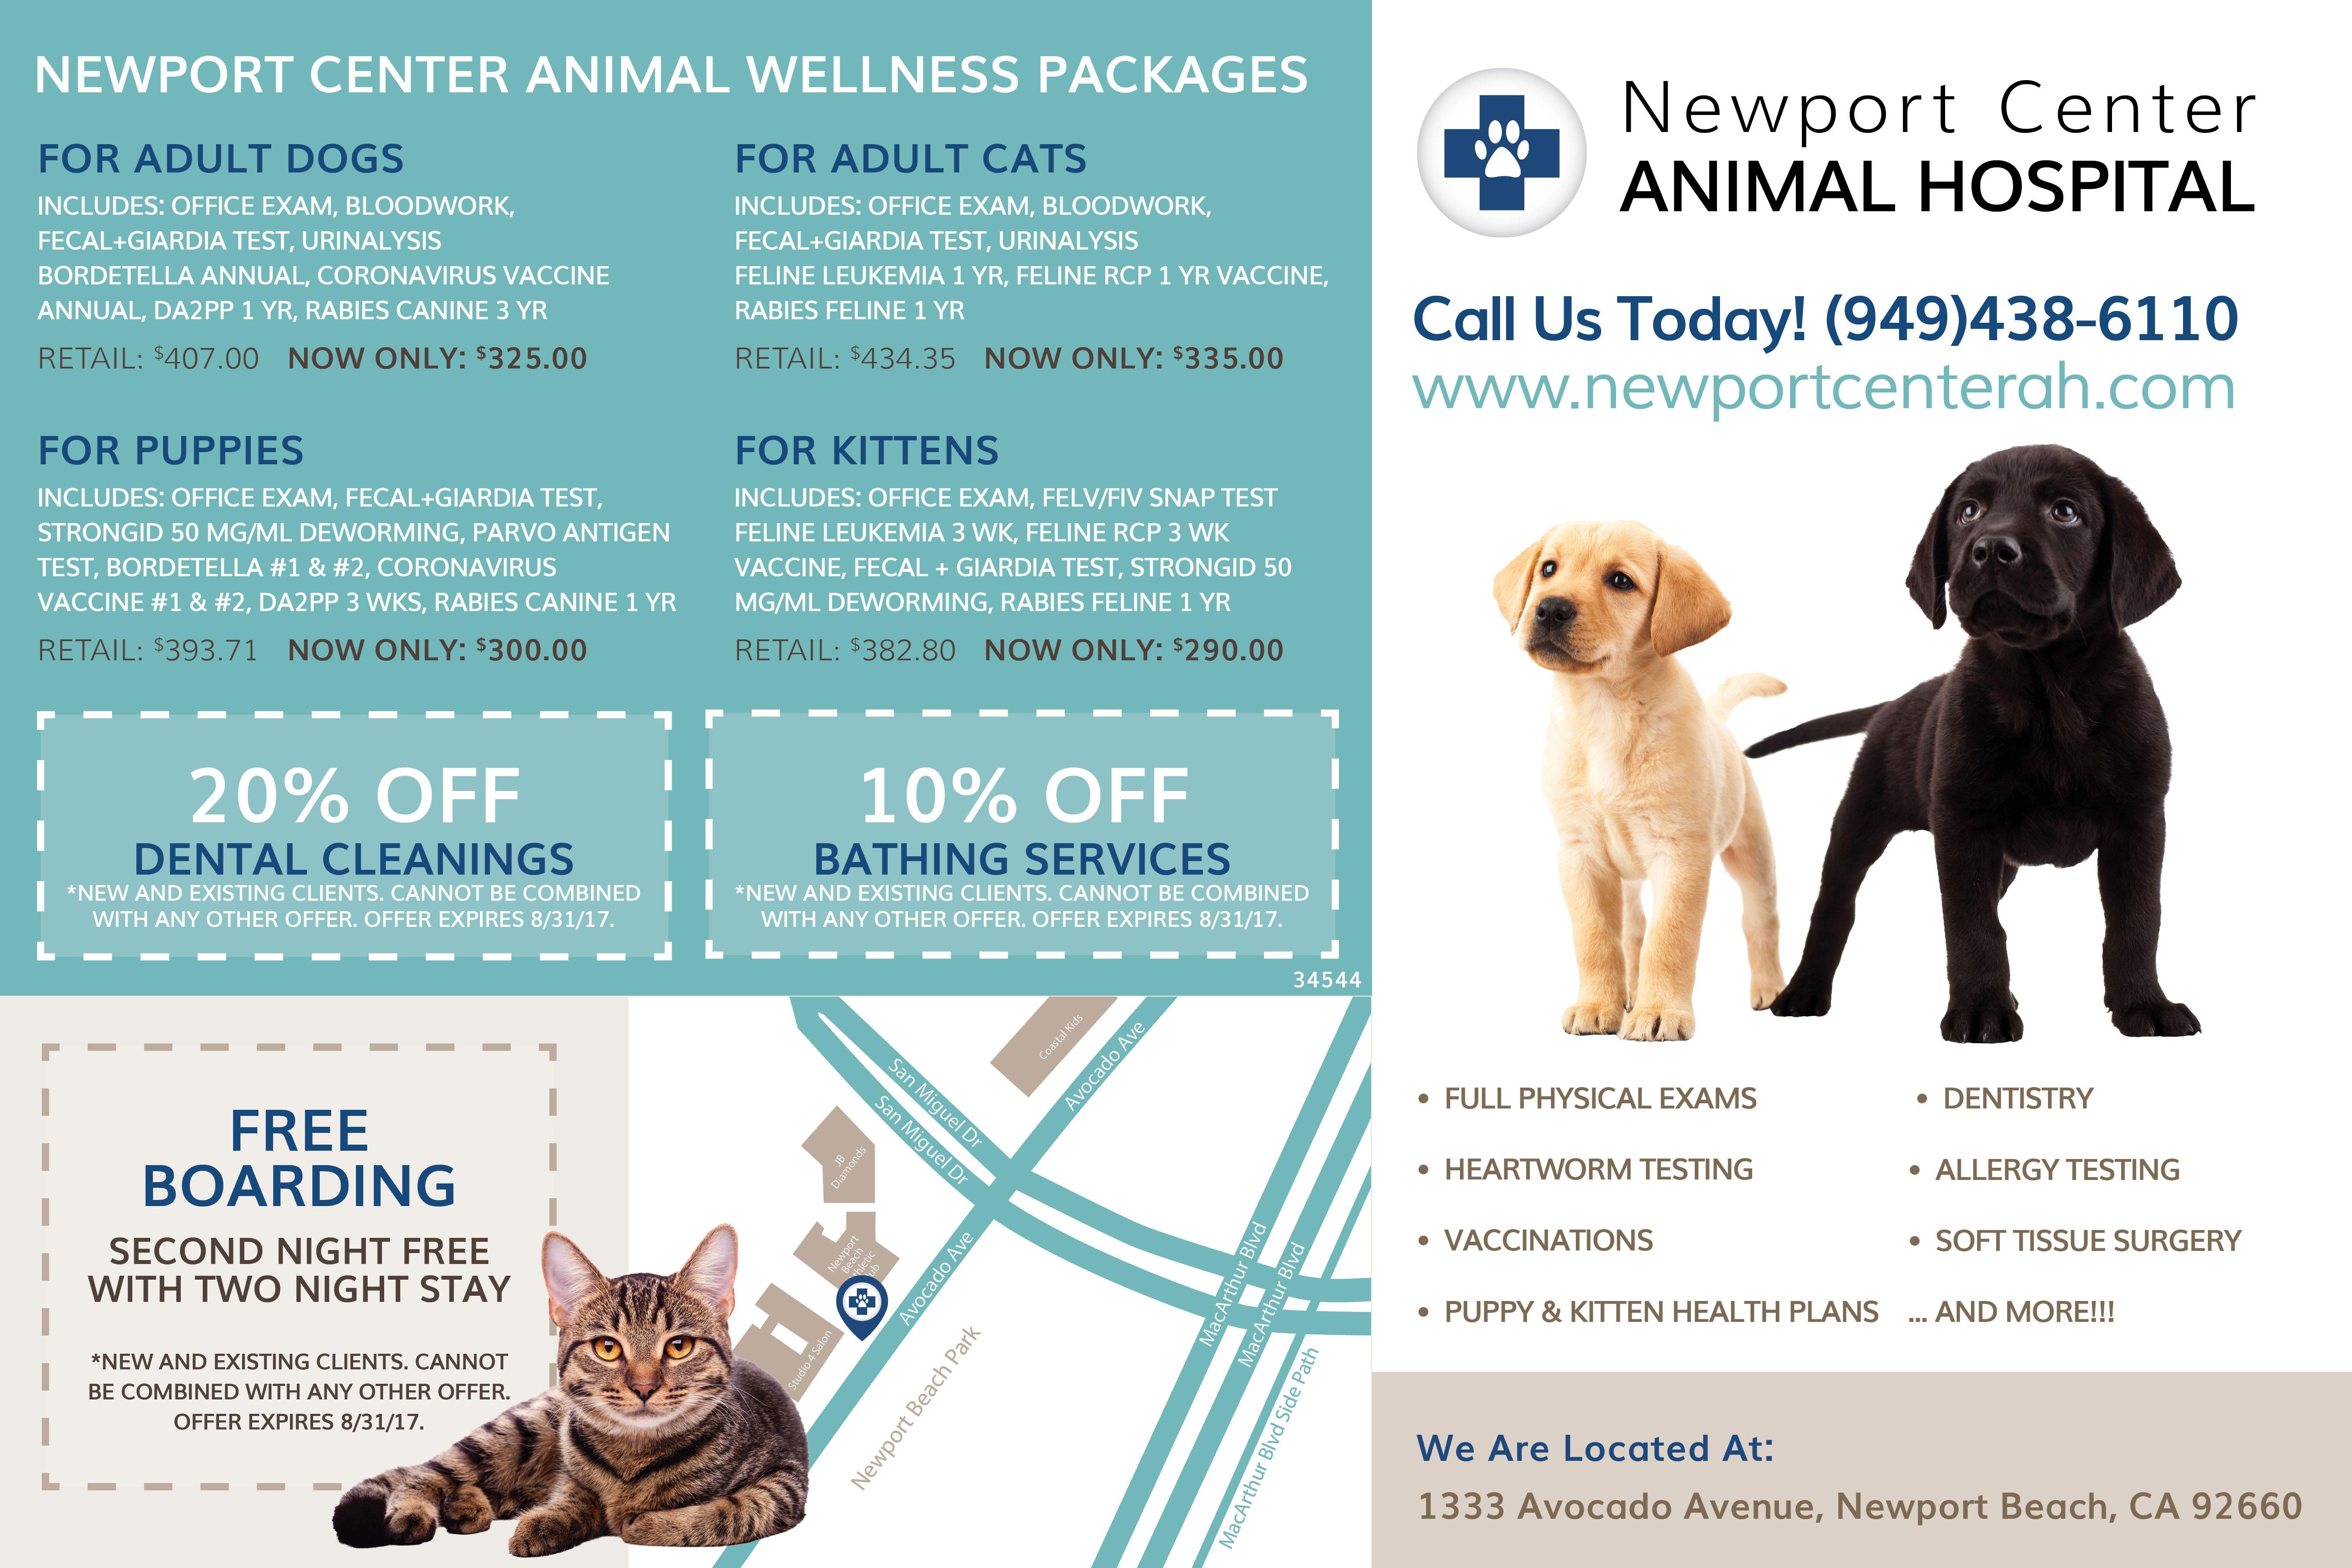 Newport Center Animal Hospital Specials Back   Animal Boarding, Veterinary Care and Hospital in Newport Beach